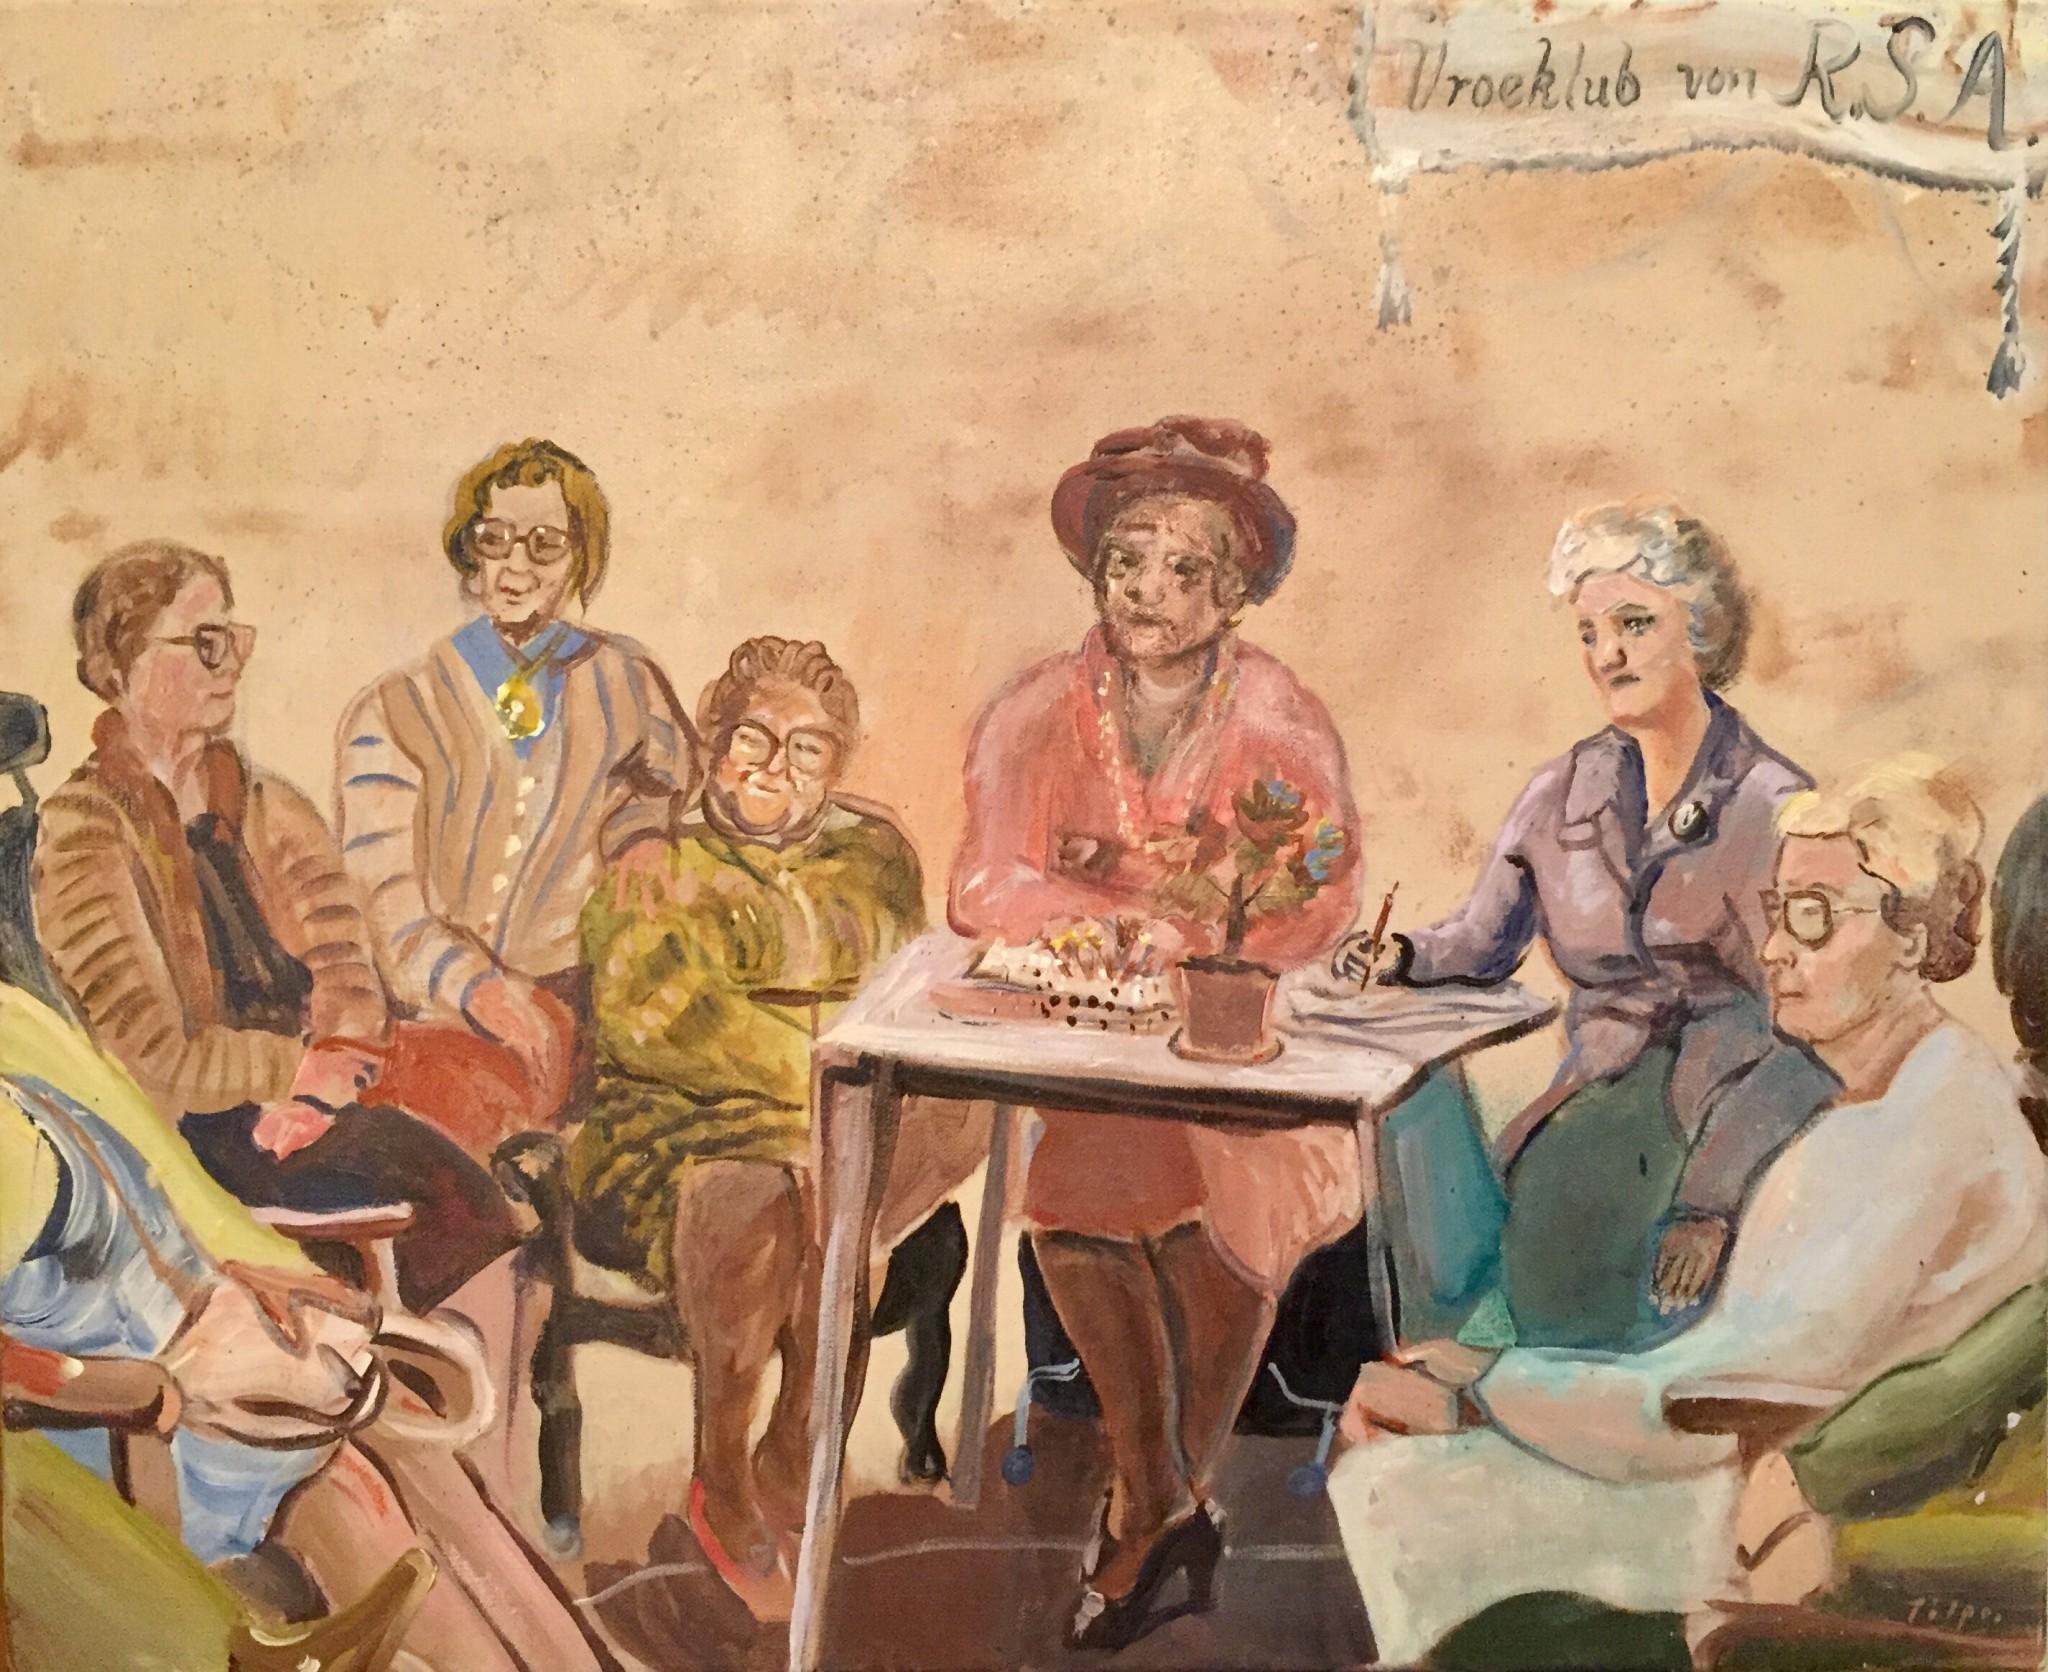 Vroeklub von R.S.A. 50x61 cm akryl på duk, 2018